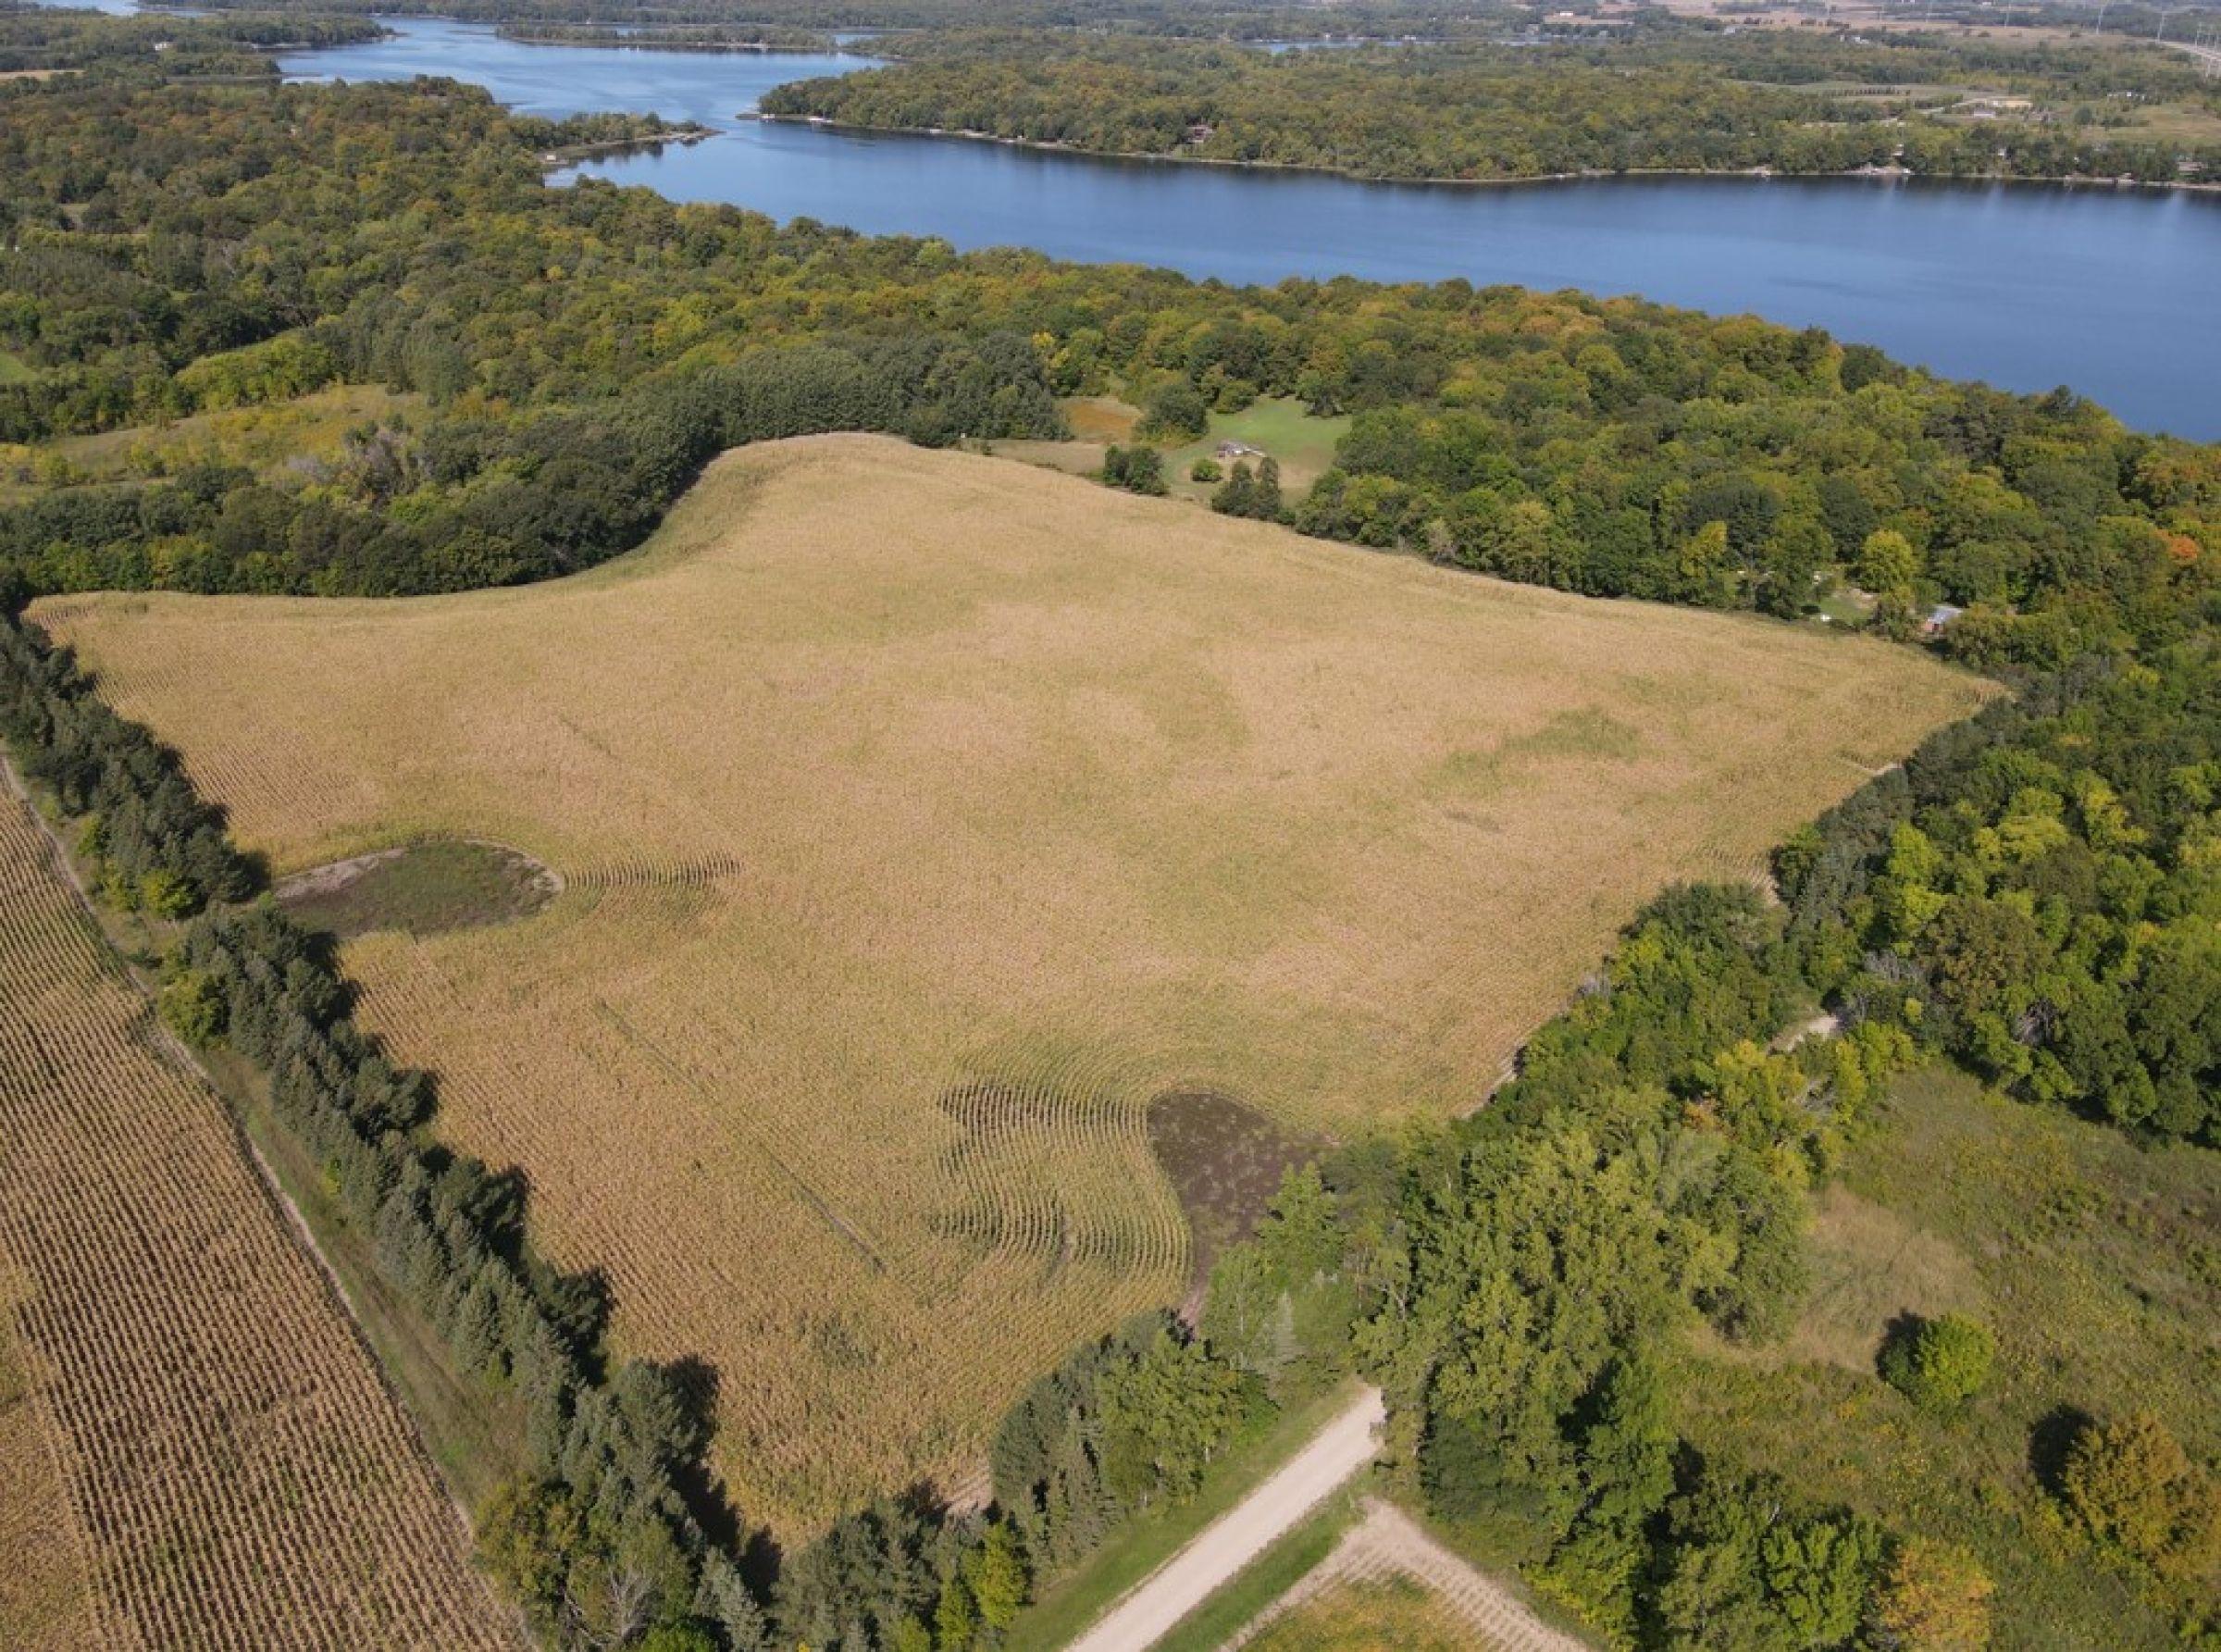 auctions-douglas-county-minnesota-40-acres-listing-number-15777-0-2021-09-24-193531.jpg